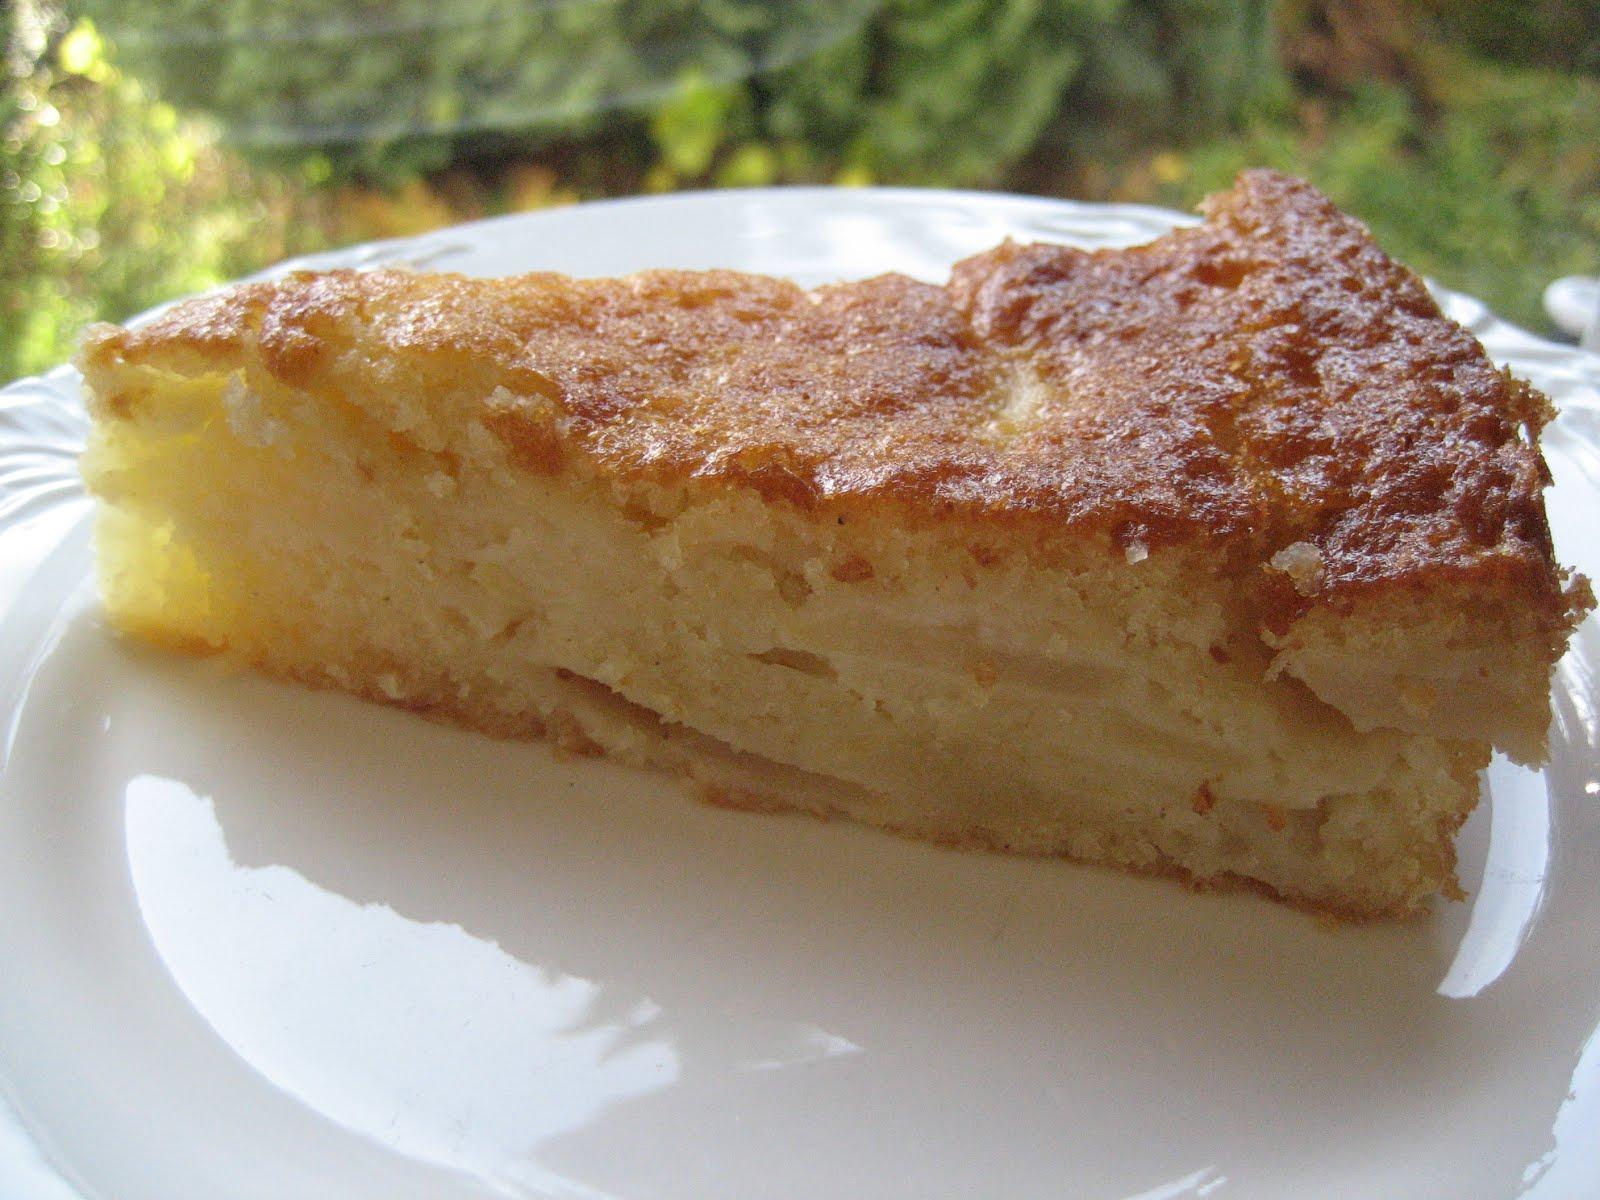 Dolce Torta Rustica Di Mele Apfelkuchen Nach Italienischer Art